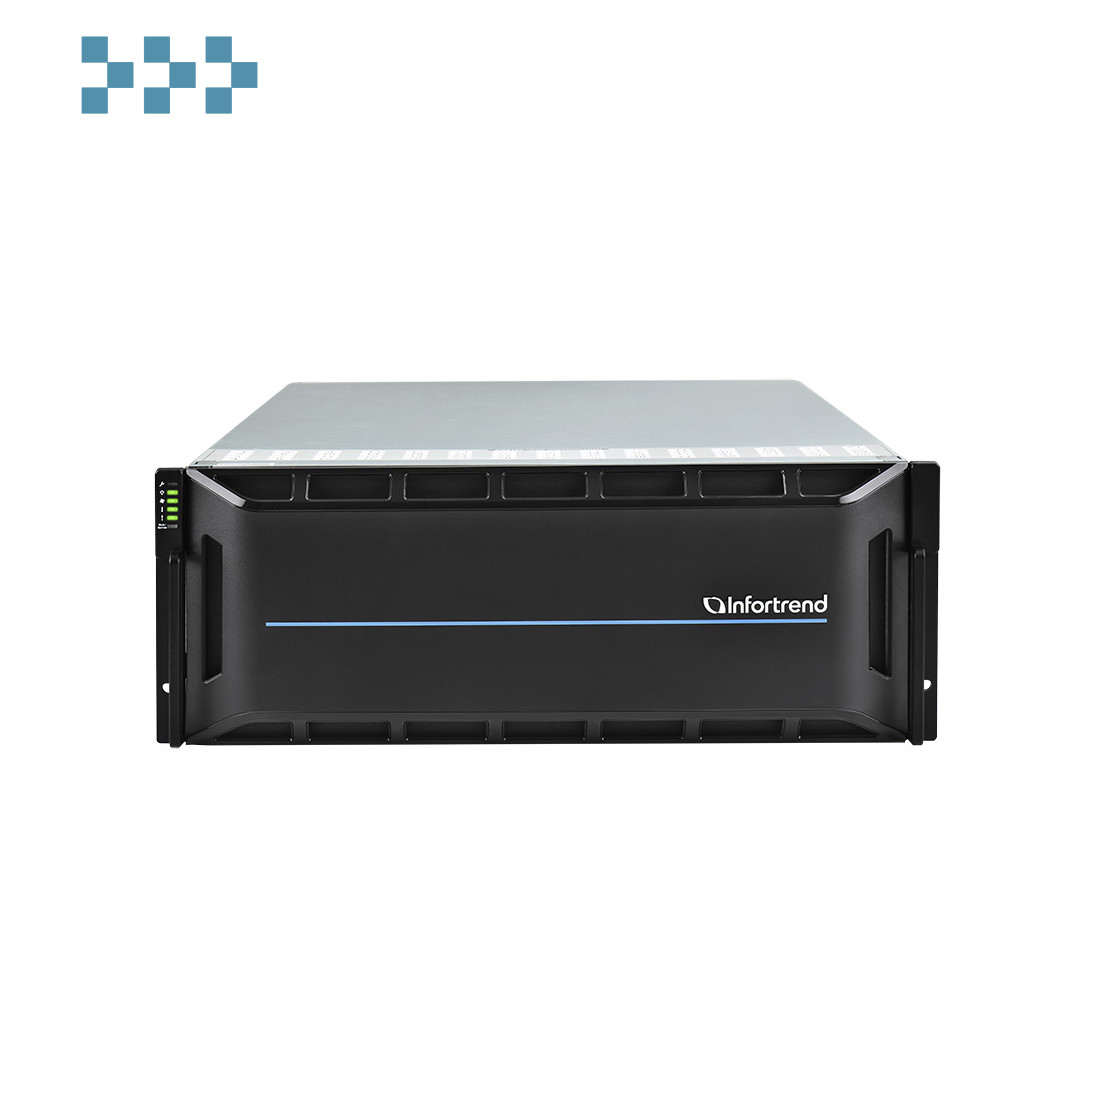 Система хранения данных Infortrend GS 3060RTCL-D